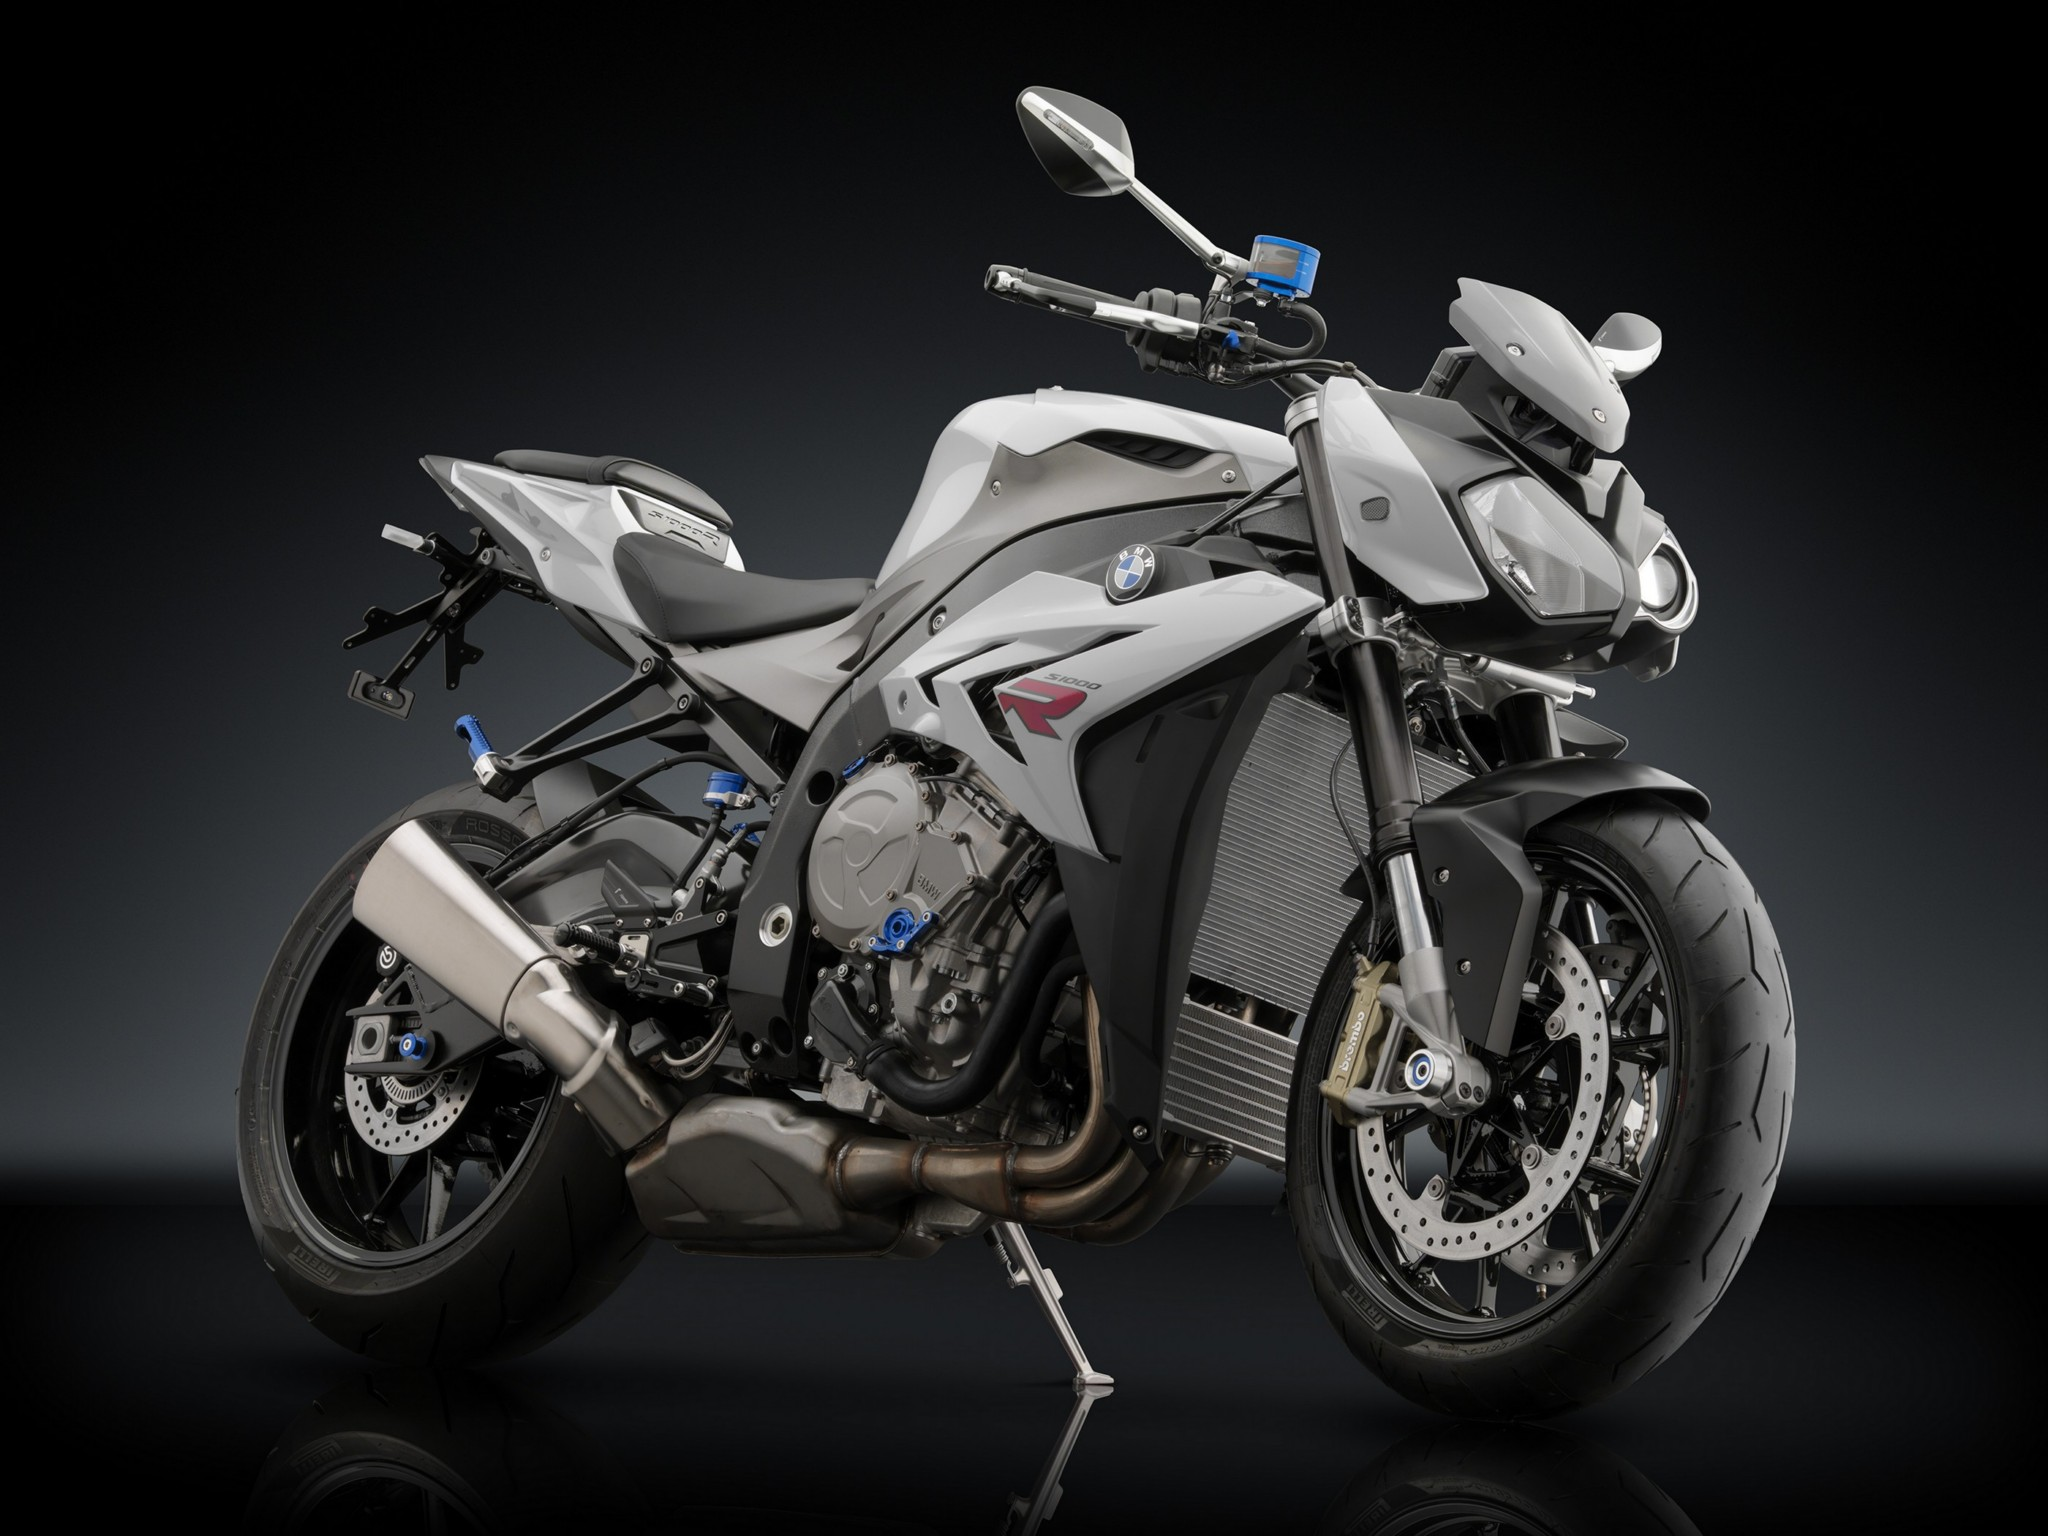 Nissan Usa 370z BMW S1000R Receives Rizoma Upgrades - autoevolution